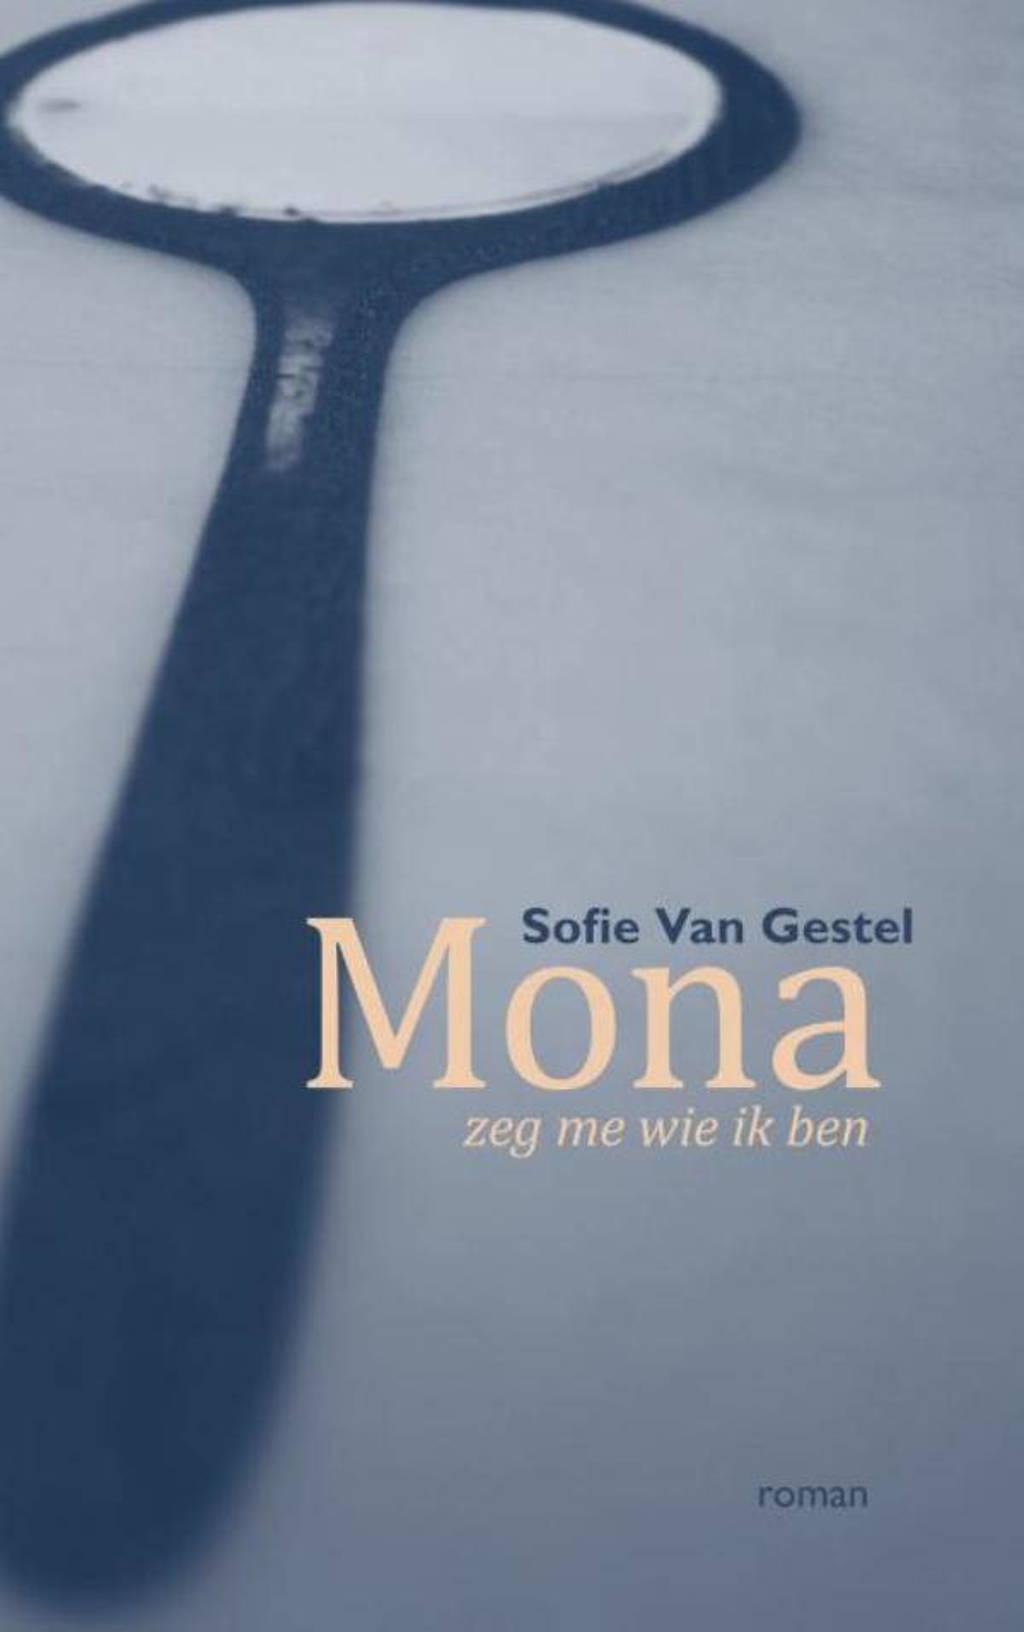 Mona - Sofie Van Gestel